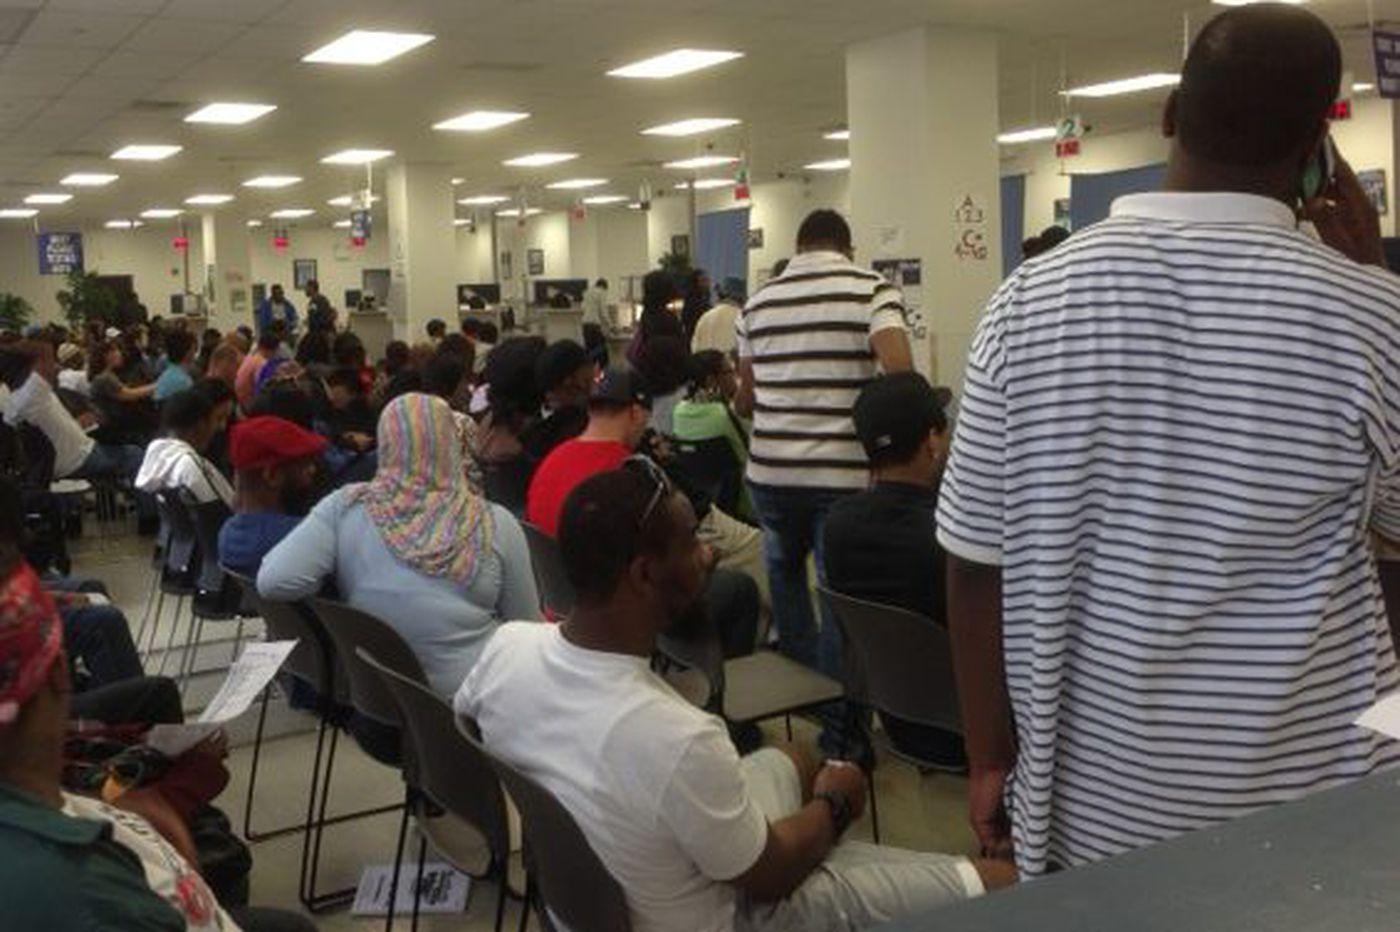 Sloppy Pa. bureaucracy registered noncitizens to vote | Editorial